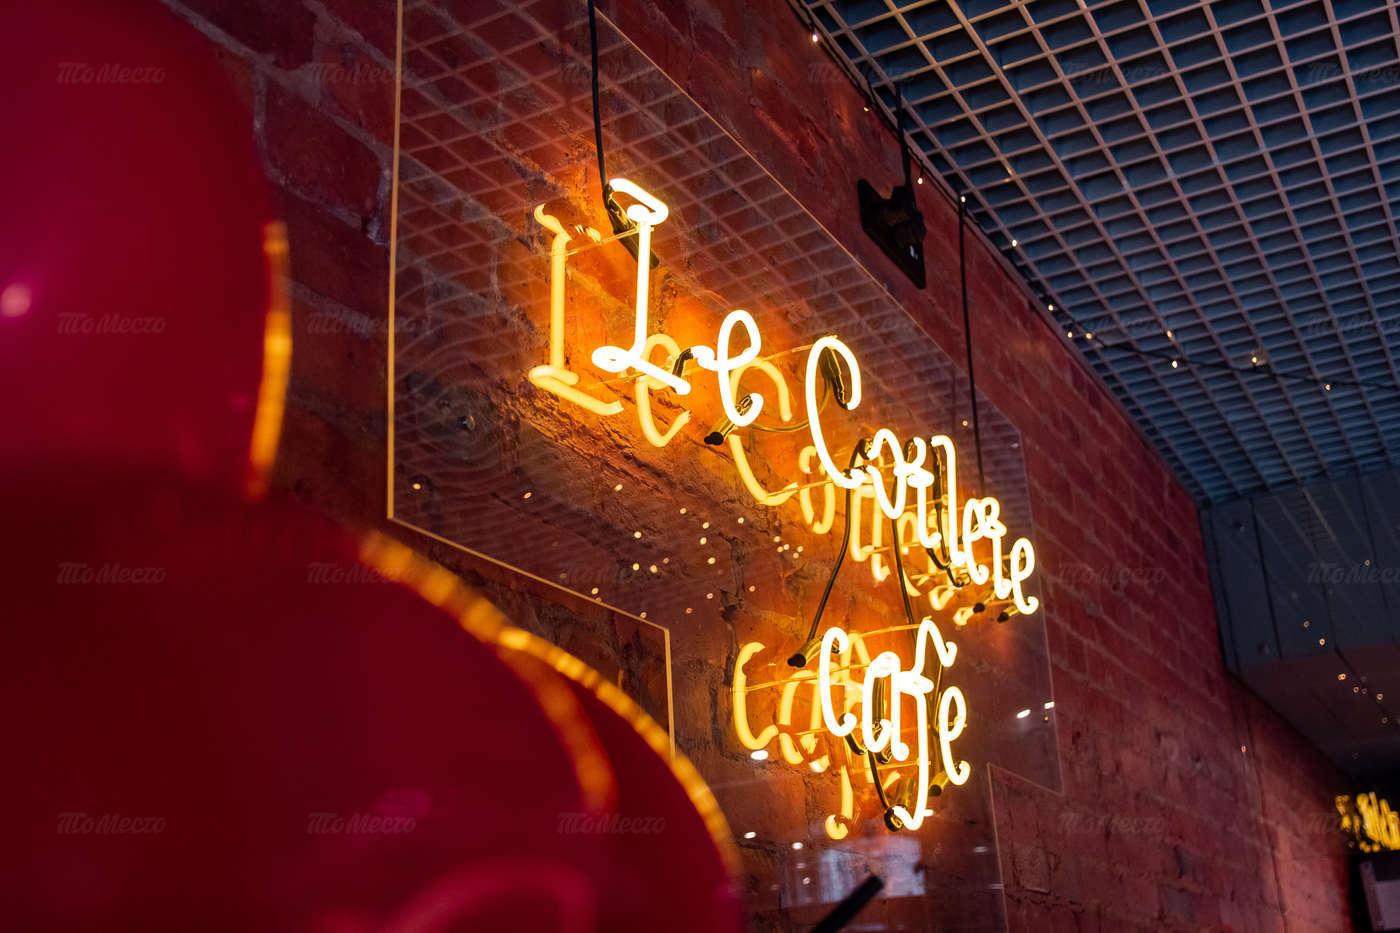 Кафе Le Cotlete Cafe на Чайковского фото 11